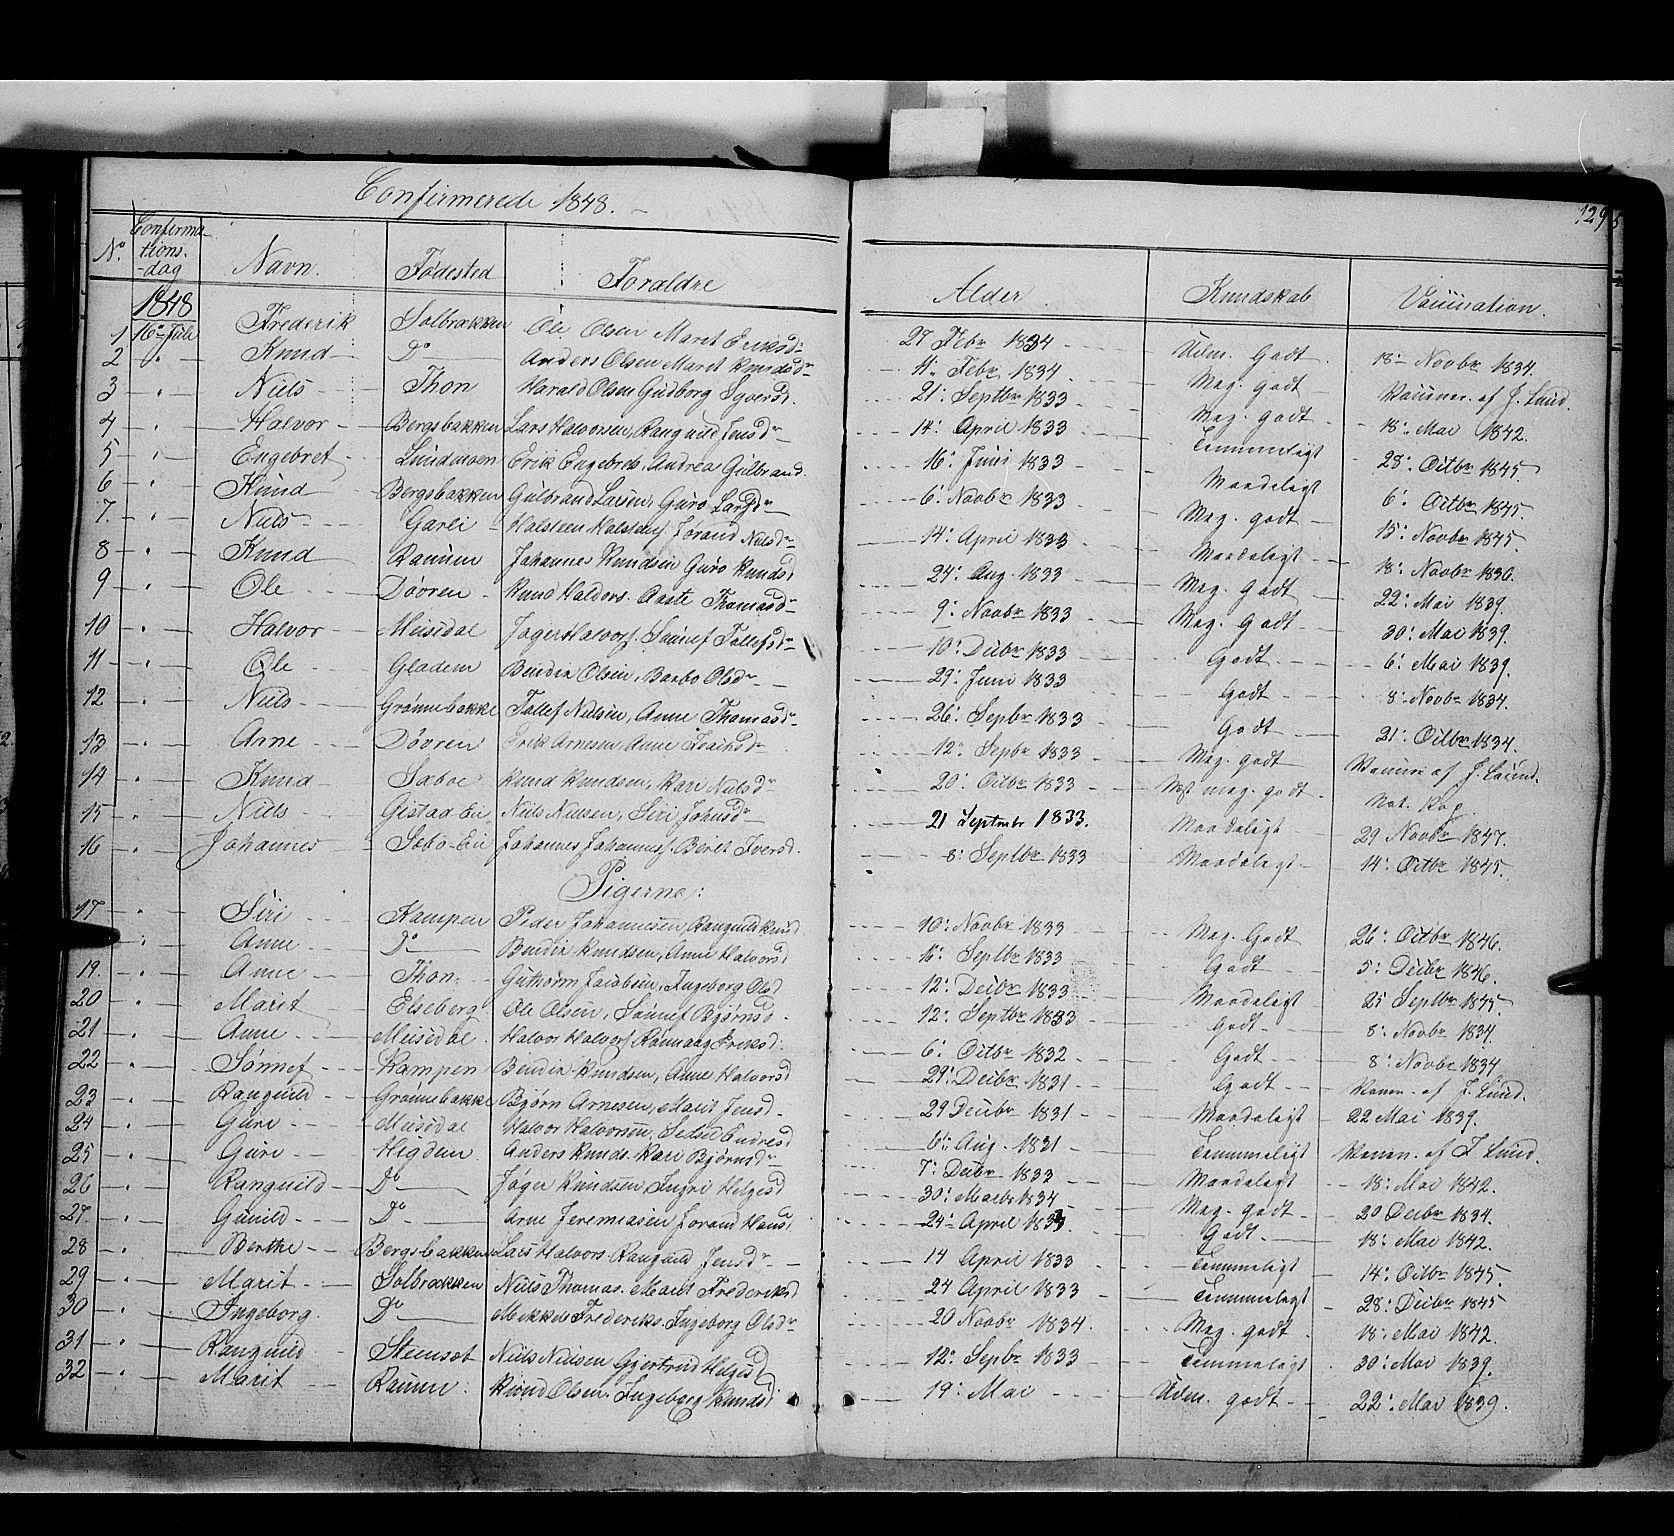 SAH, Nord-Aurdal prestekontor, Ministerialbok nr. 7, 1842-1863, s. 129